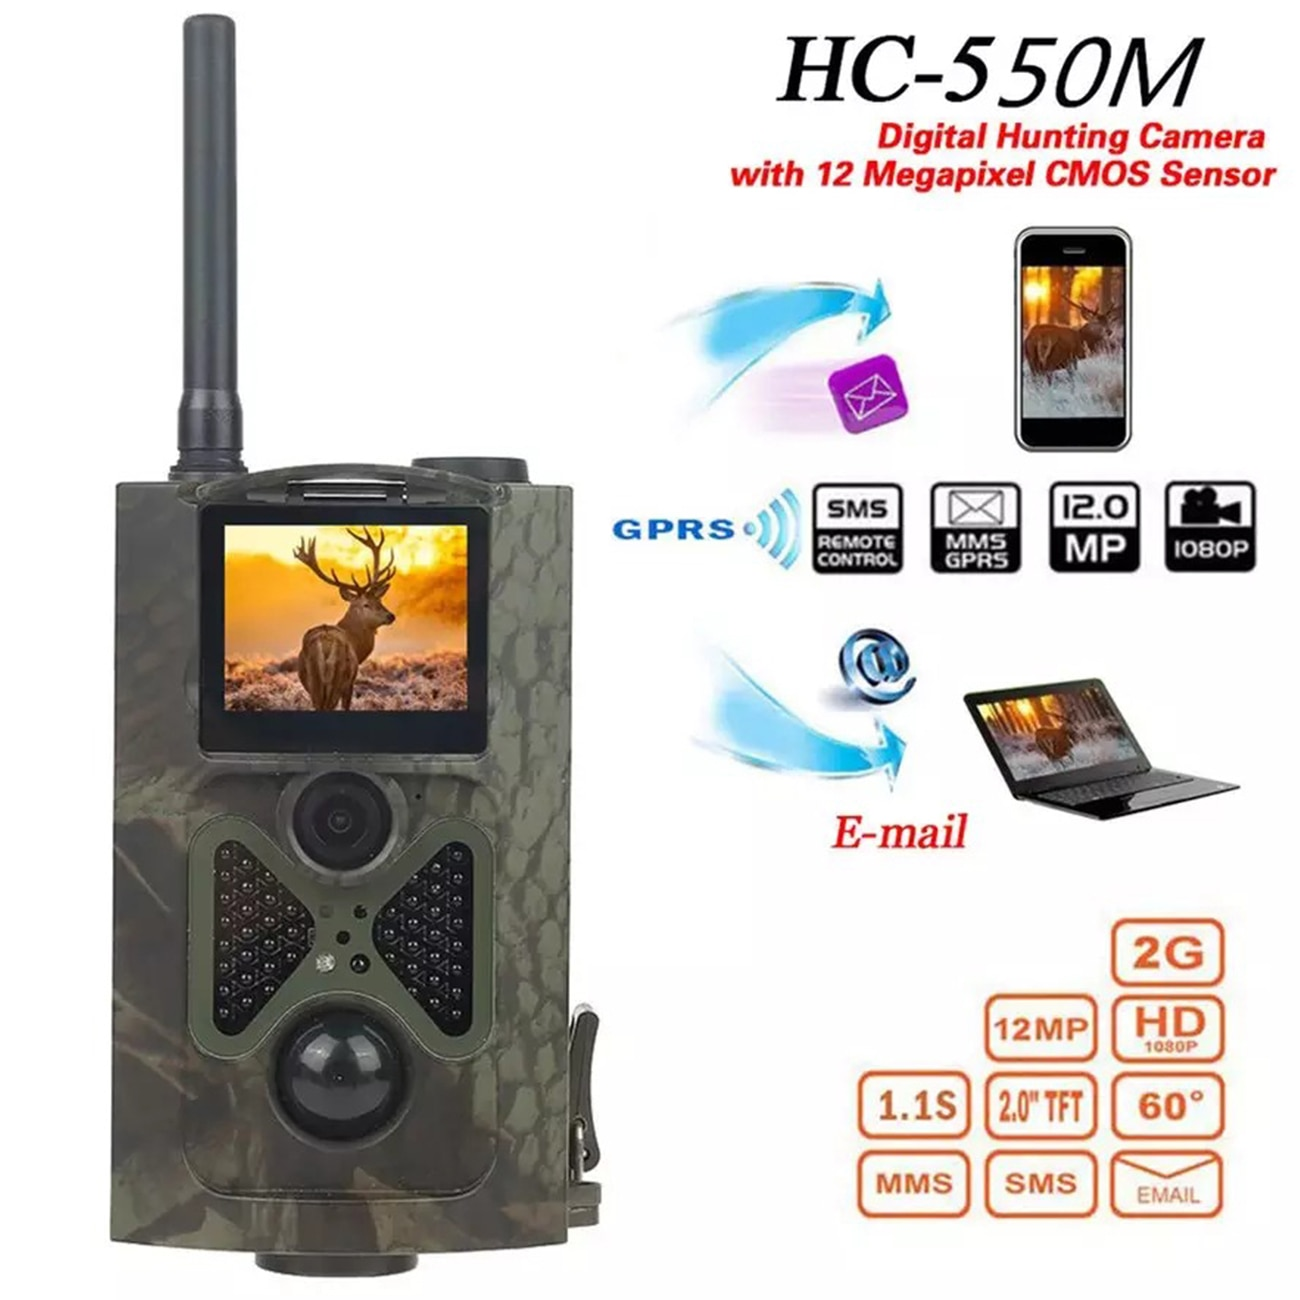 HC550M 2G كاميرا تعقب SMS MMS GSM GPRS 16MP 1080P ليلة كاميرا الصيد البصري اللاسلكية الخلوية موبايل صور الفخاخ المراقبة